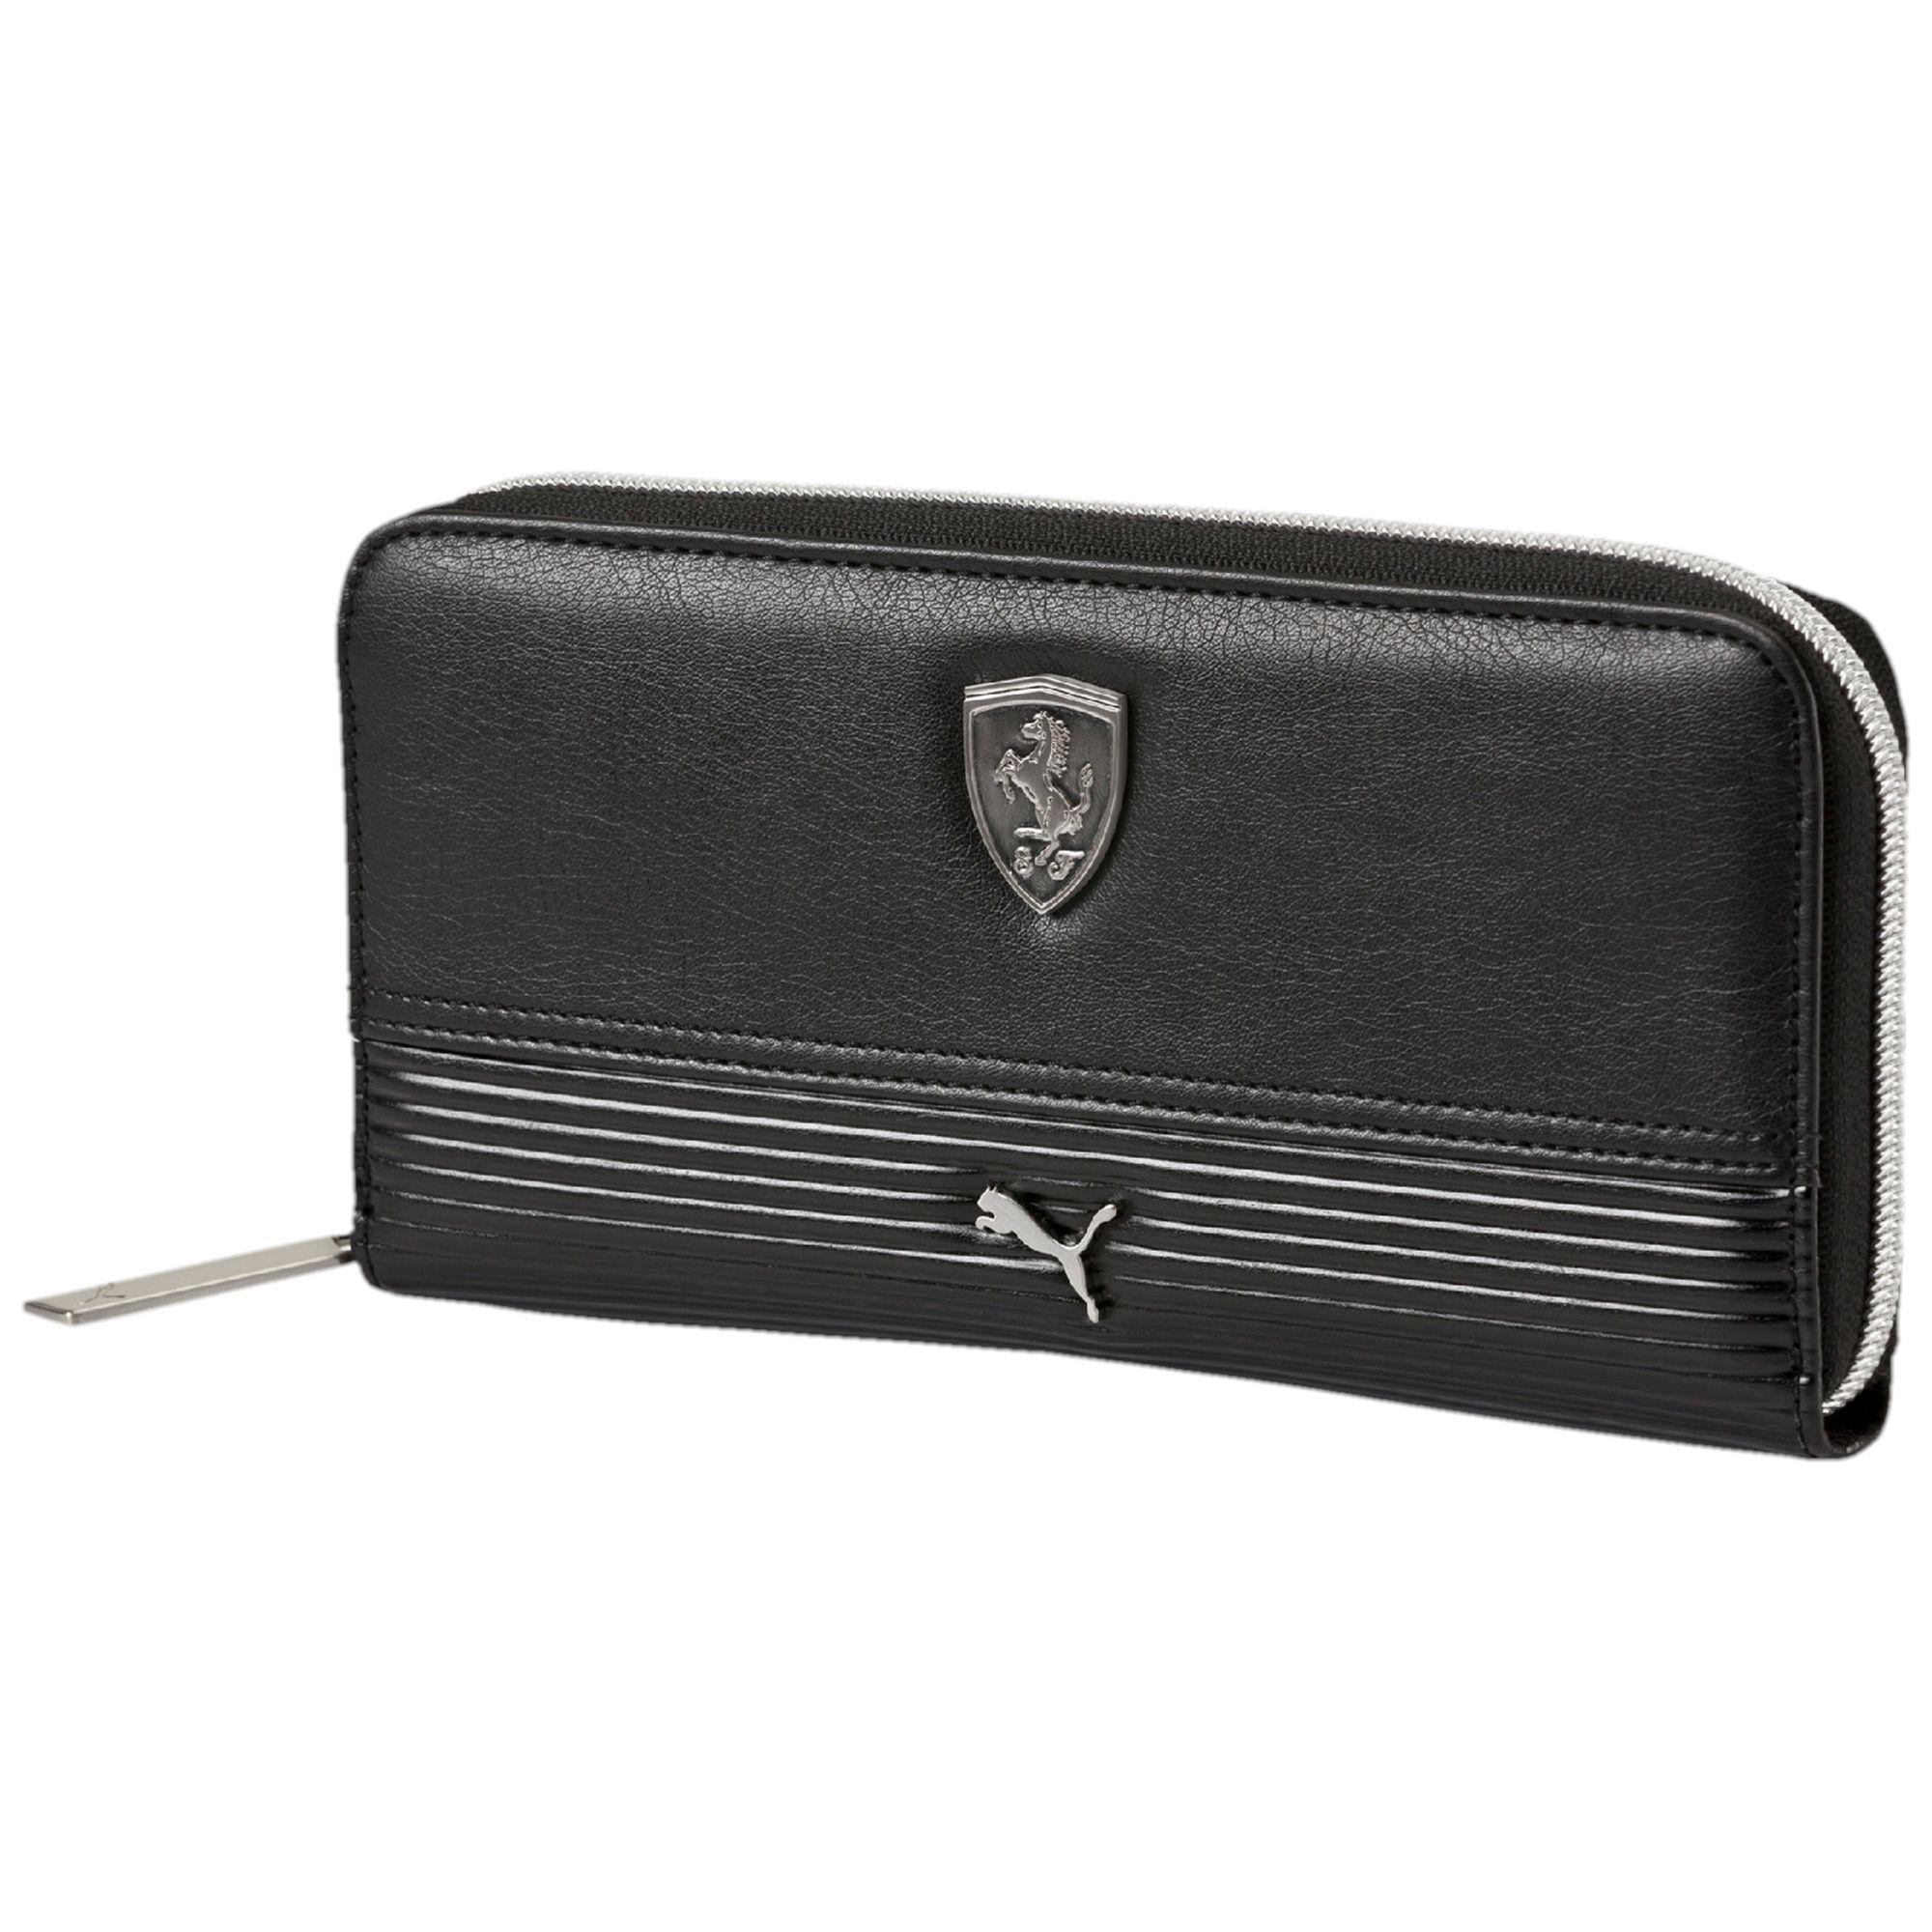 puma ferrari portemonnaie accessoires geldbeutel geldb rse automotive unisex neu ebay. Black Bedroom Furniture Sets. Home Design Ideas